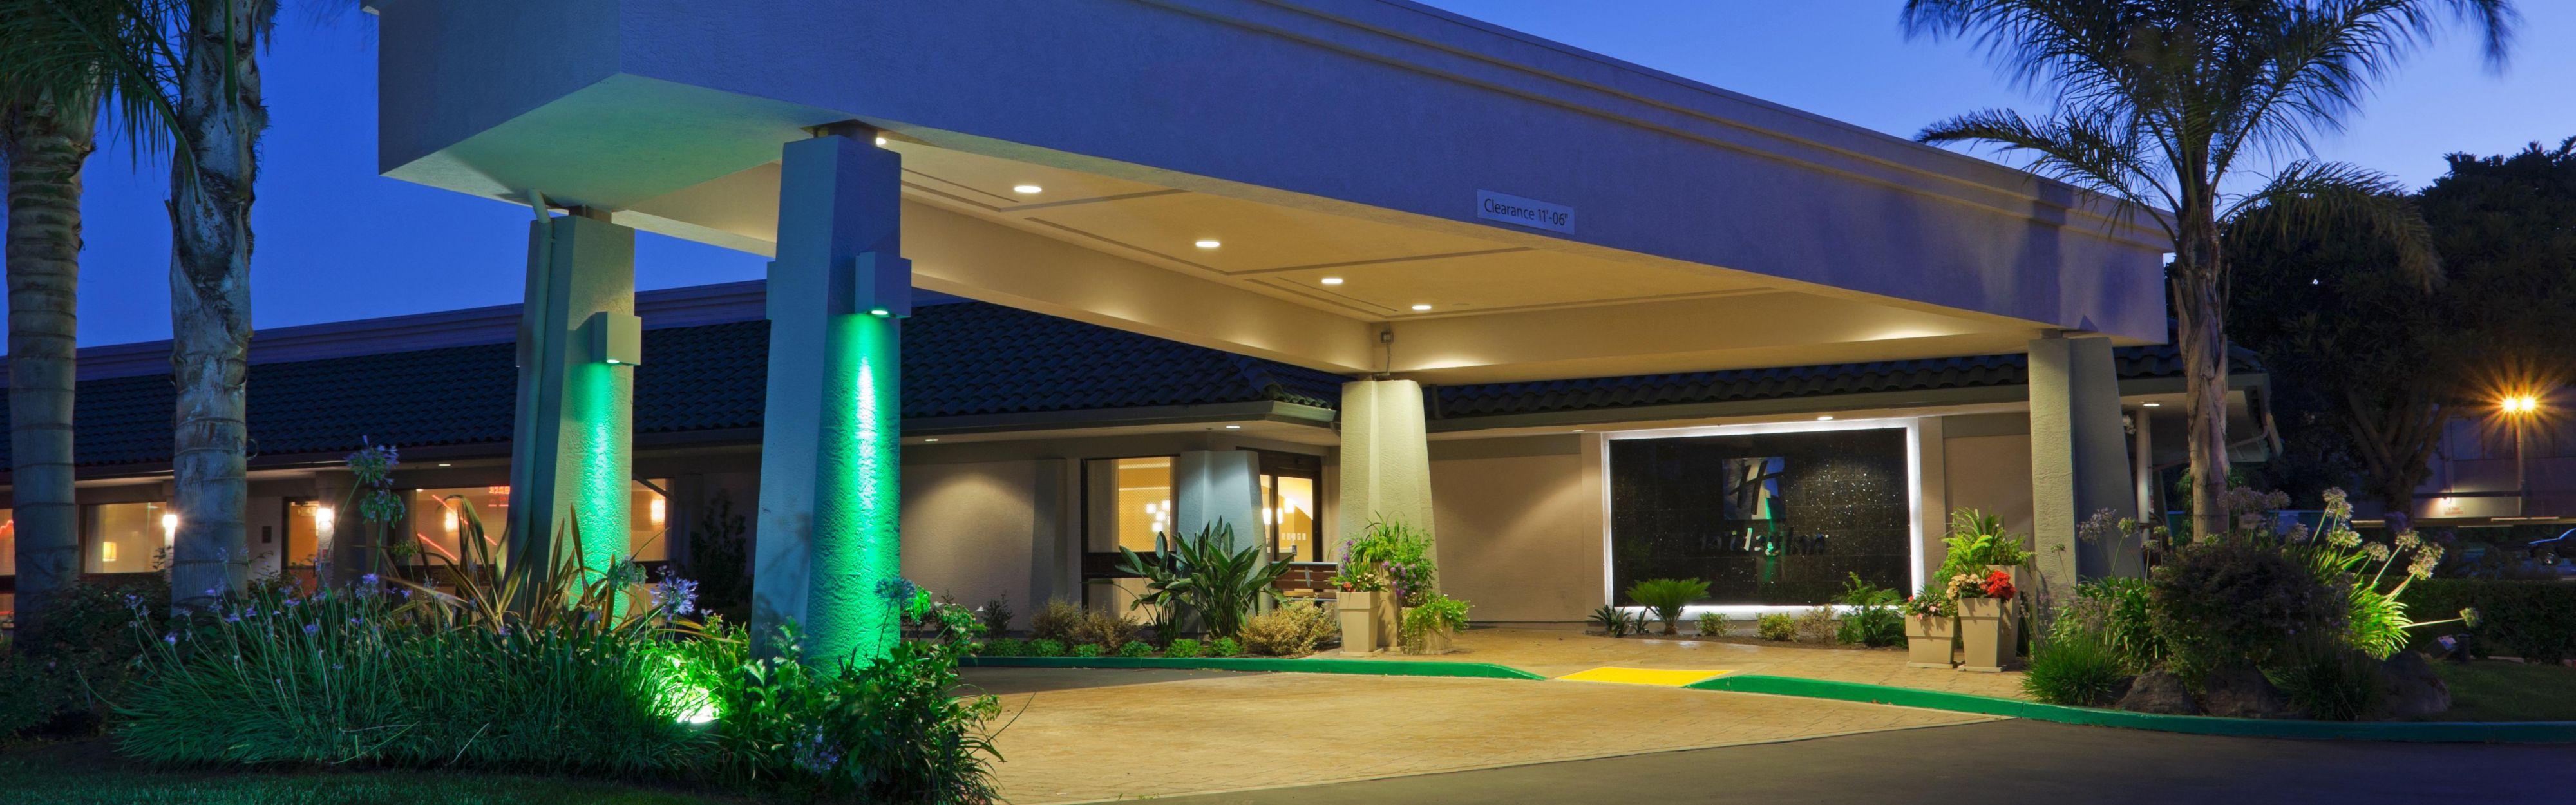 Hotels In Pleasanton Dublin Ca